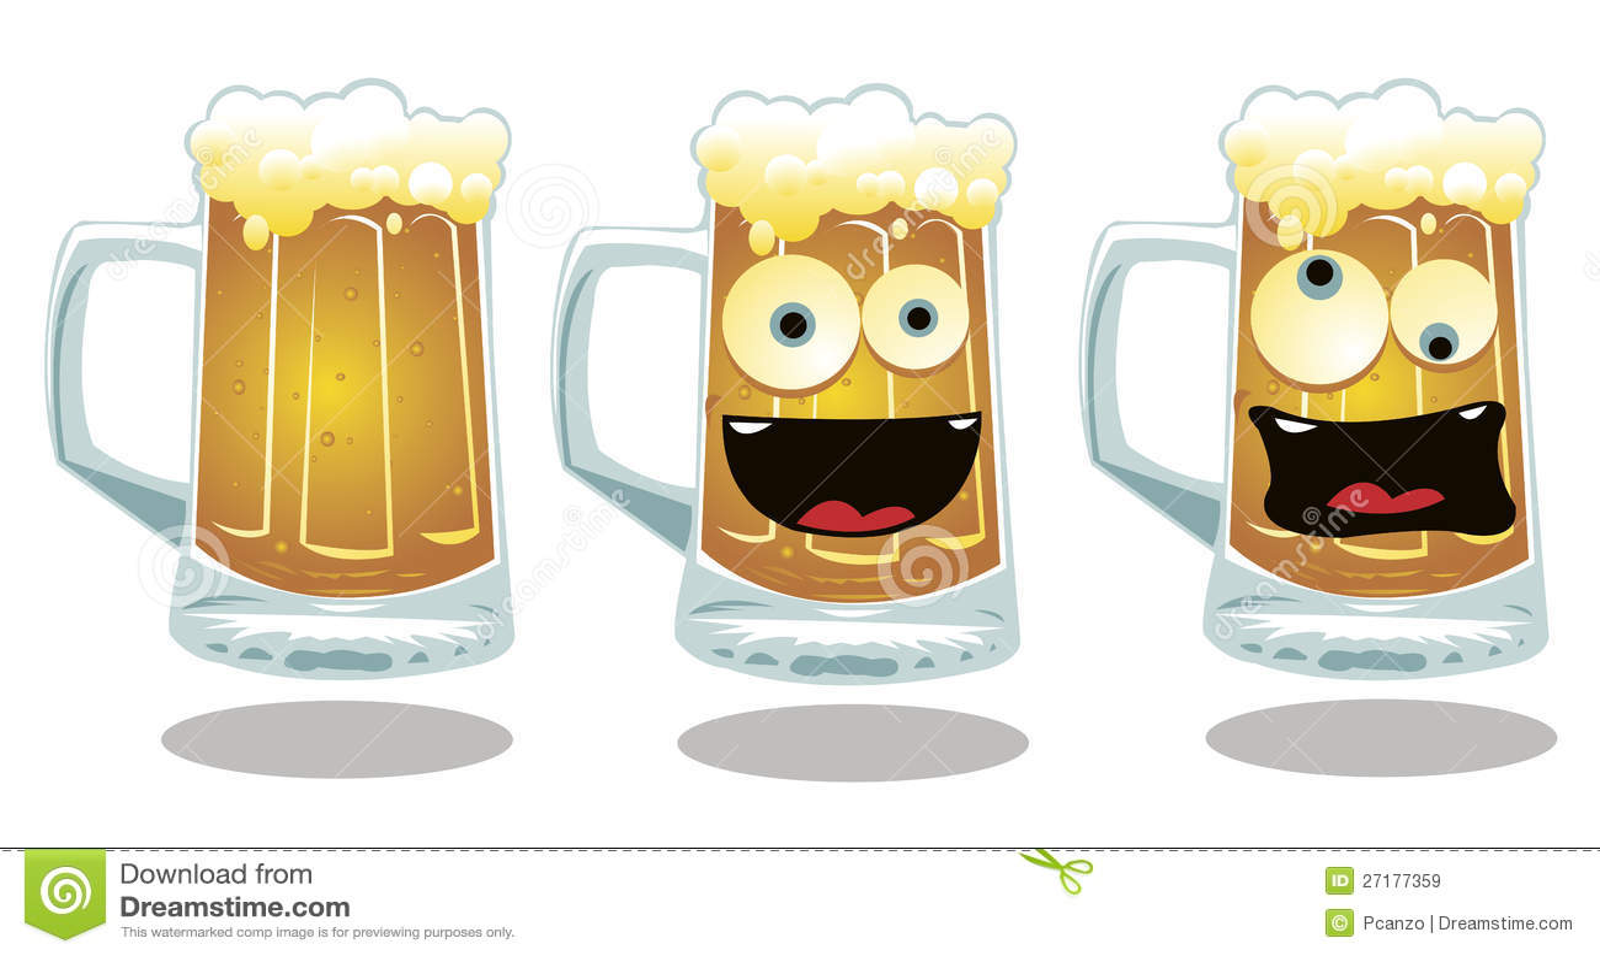 Botella De Cerveza Dibujo: Normale En Grappige Glazen Bier Vector Illustratie